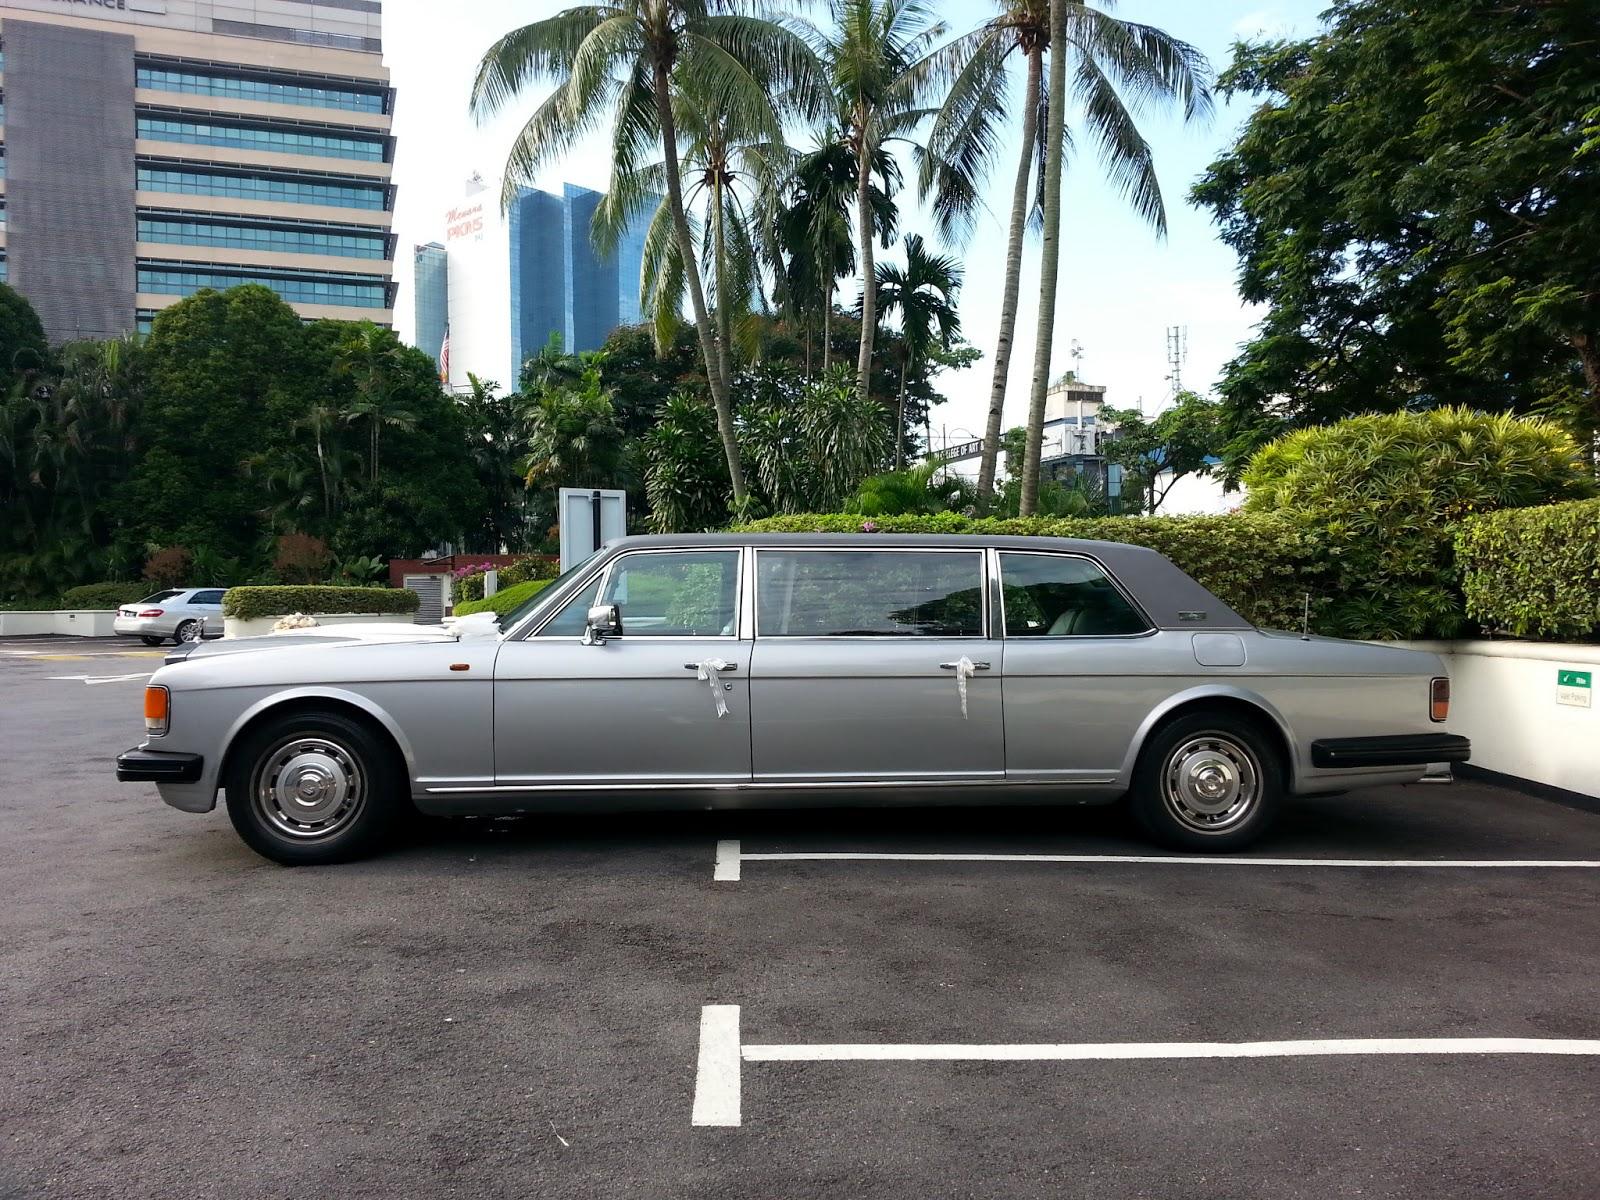 redorca malaysia wedding and event car rental rolls royce limo wedding car. Black Bedroom Furniture Sets. Home Design Ideas